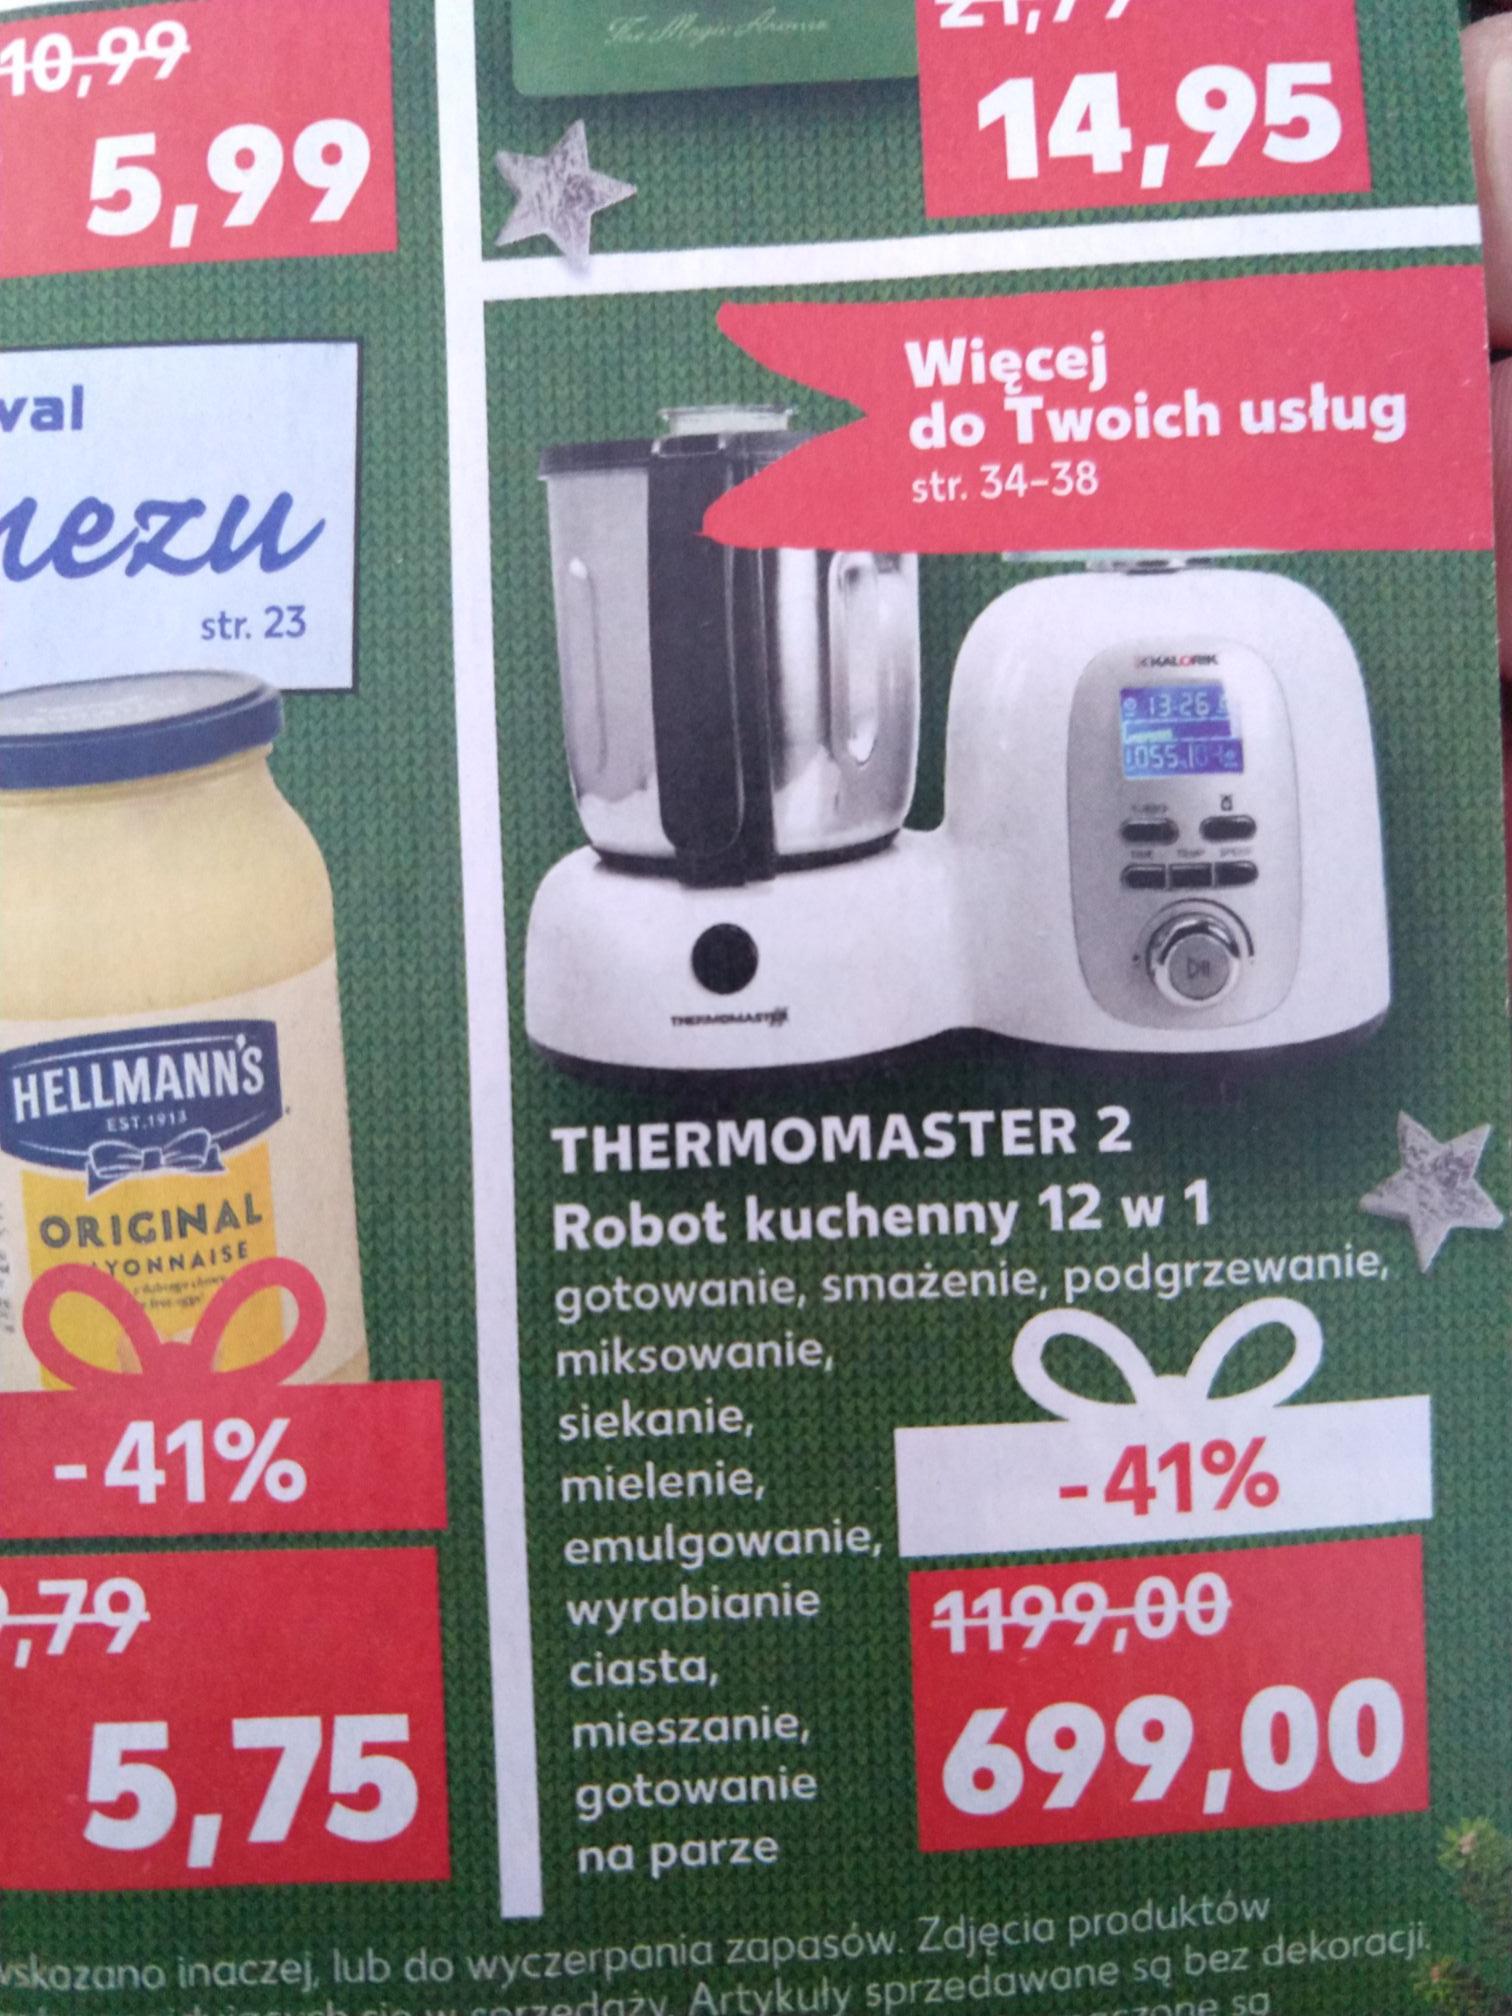 Robot kuchenny 12w1 THERMOMASTER 2 Kaufland